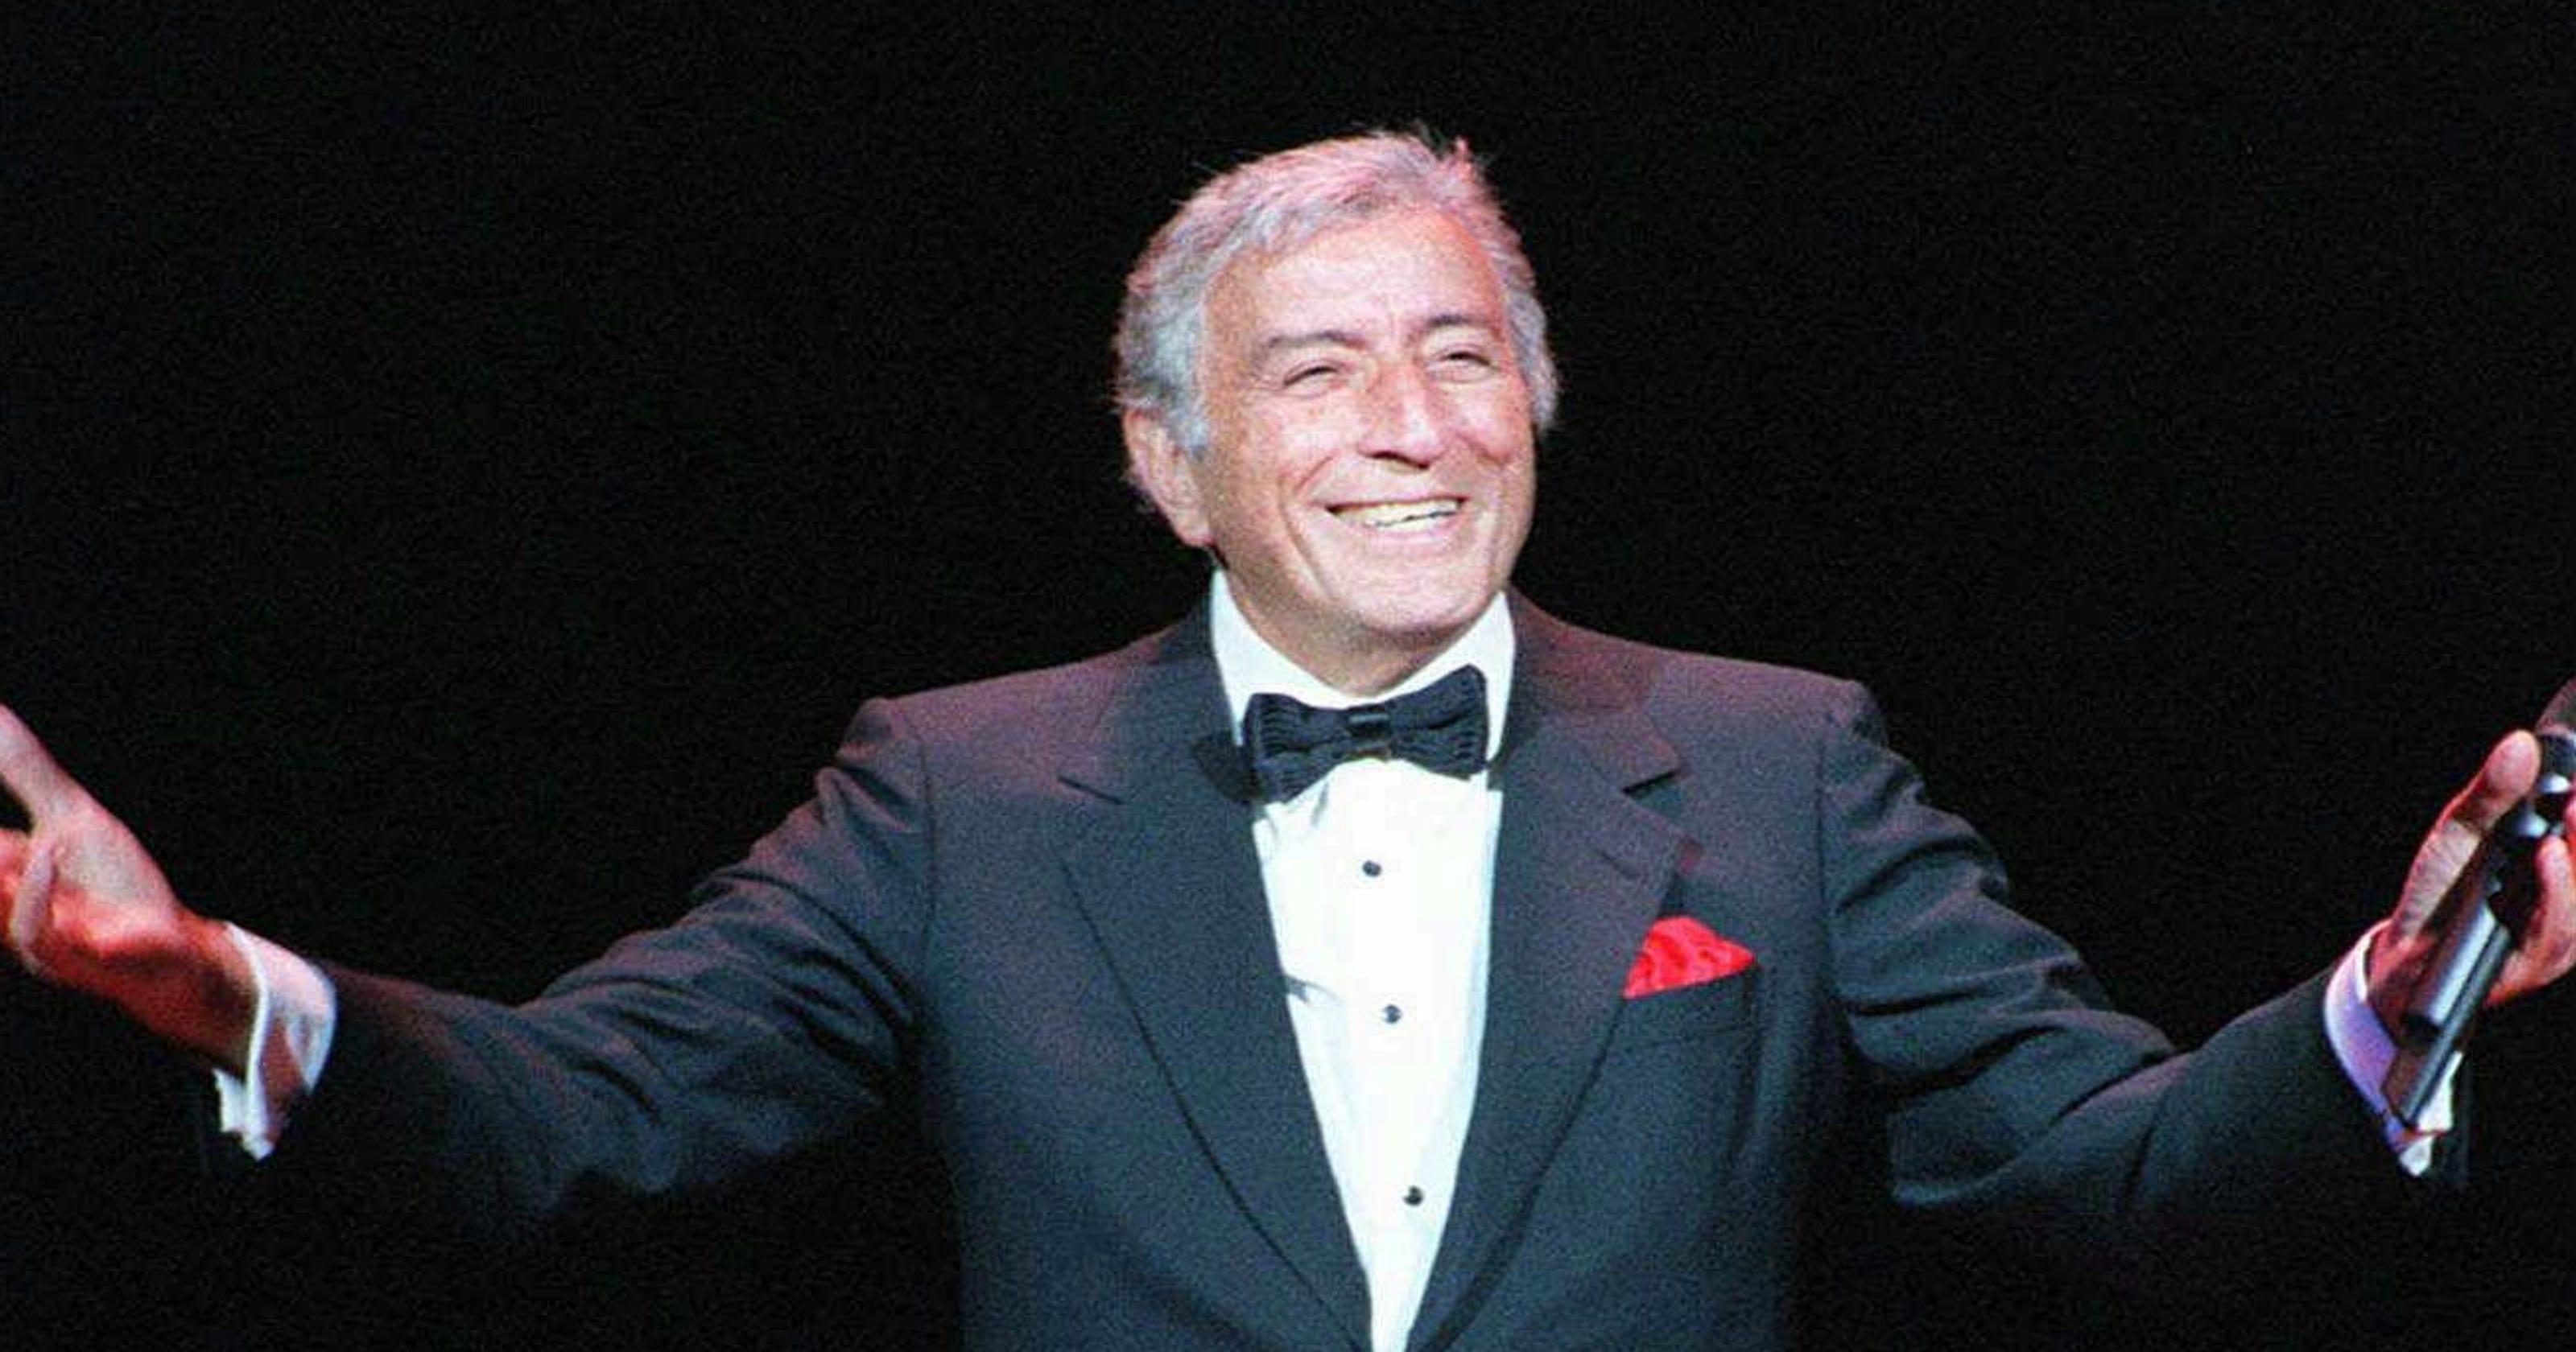 Phoenix concert news: Tony Bennett reschedules Celebrity